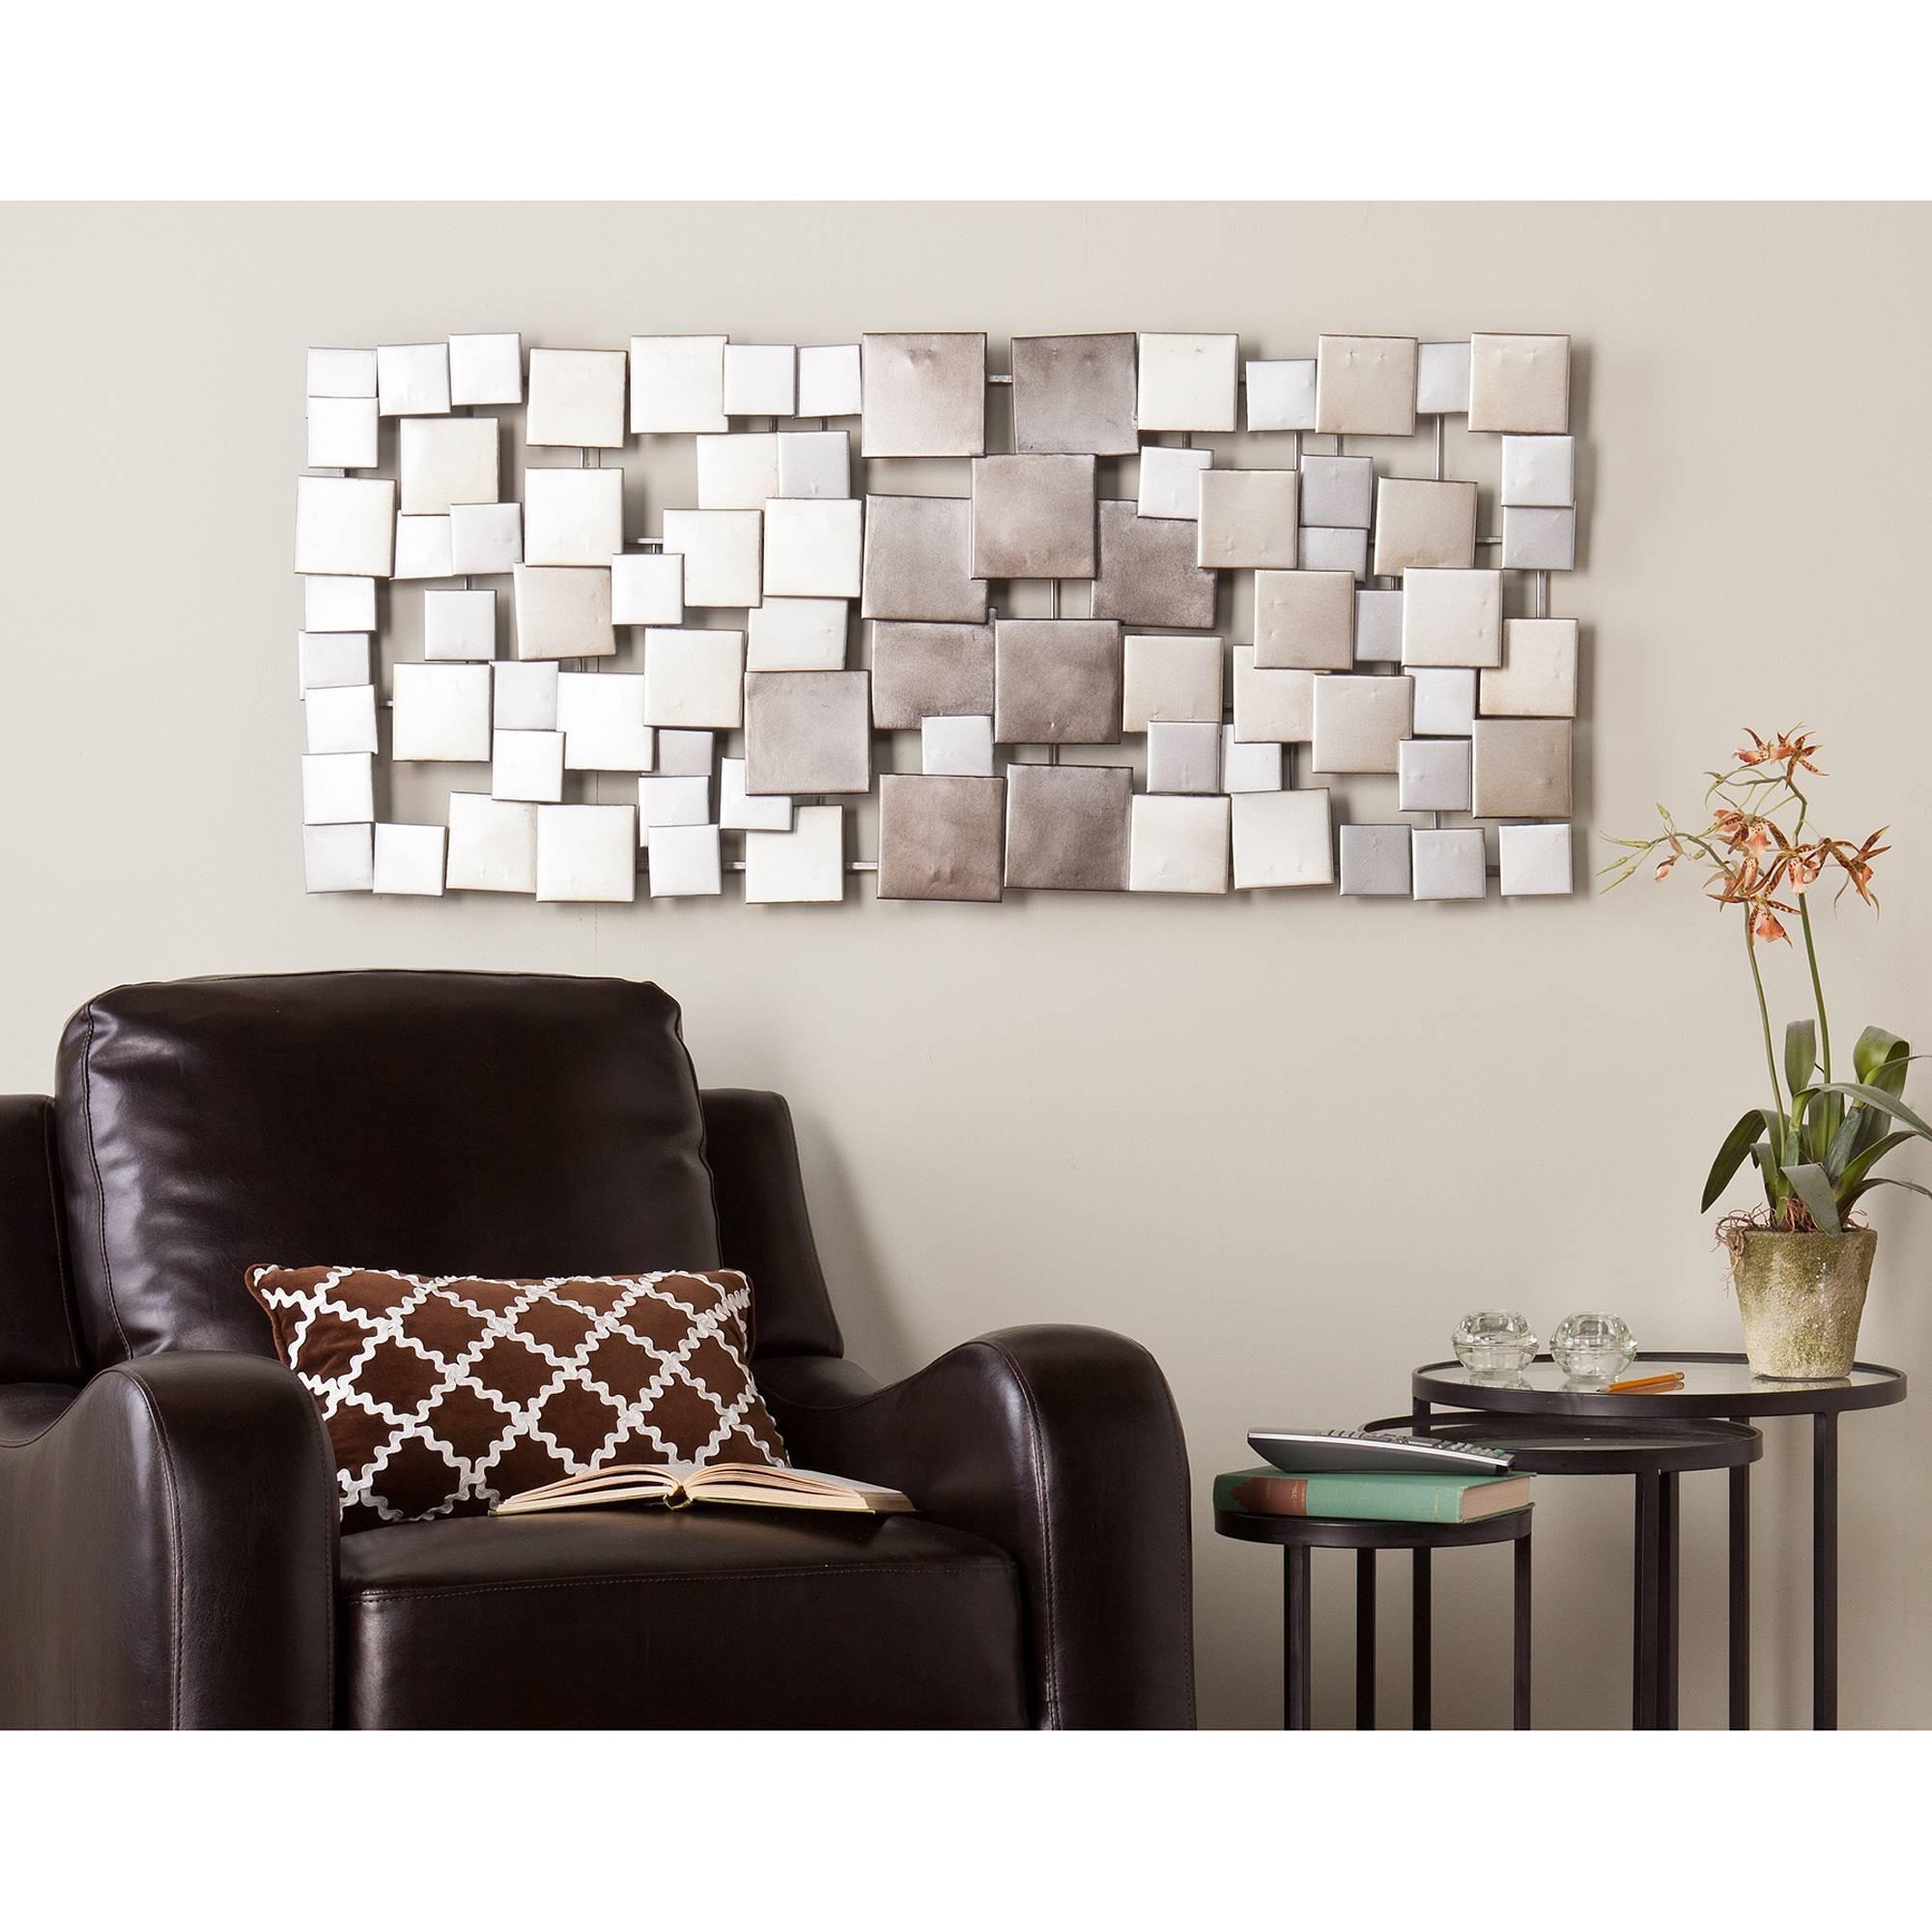 Metal Wall Art – Walmart Regarding Most Current Multi Color Metal Wall Art (View 7 of 20)